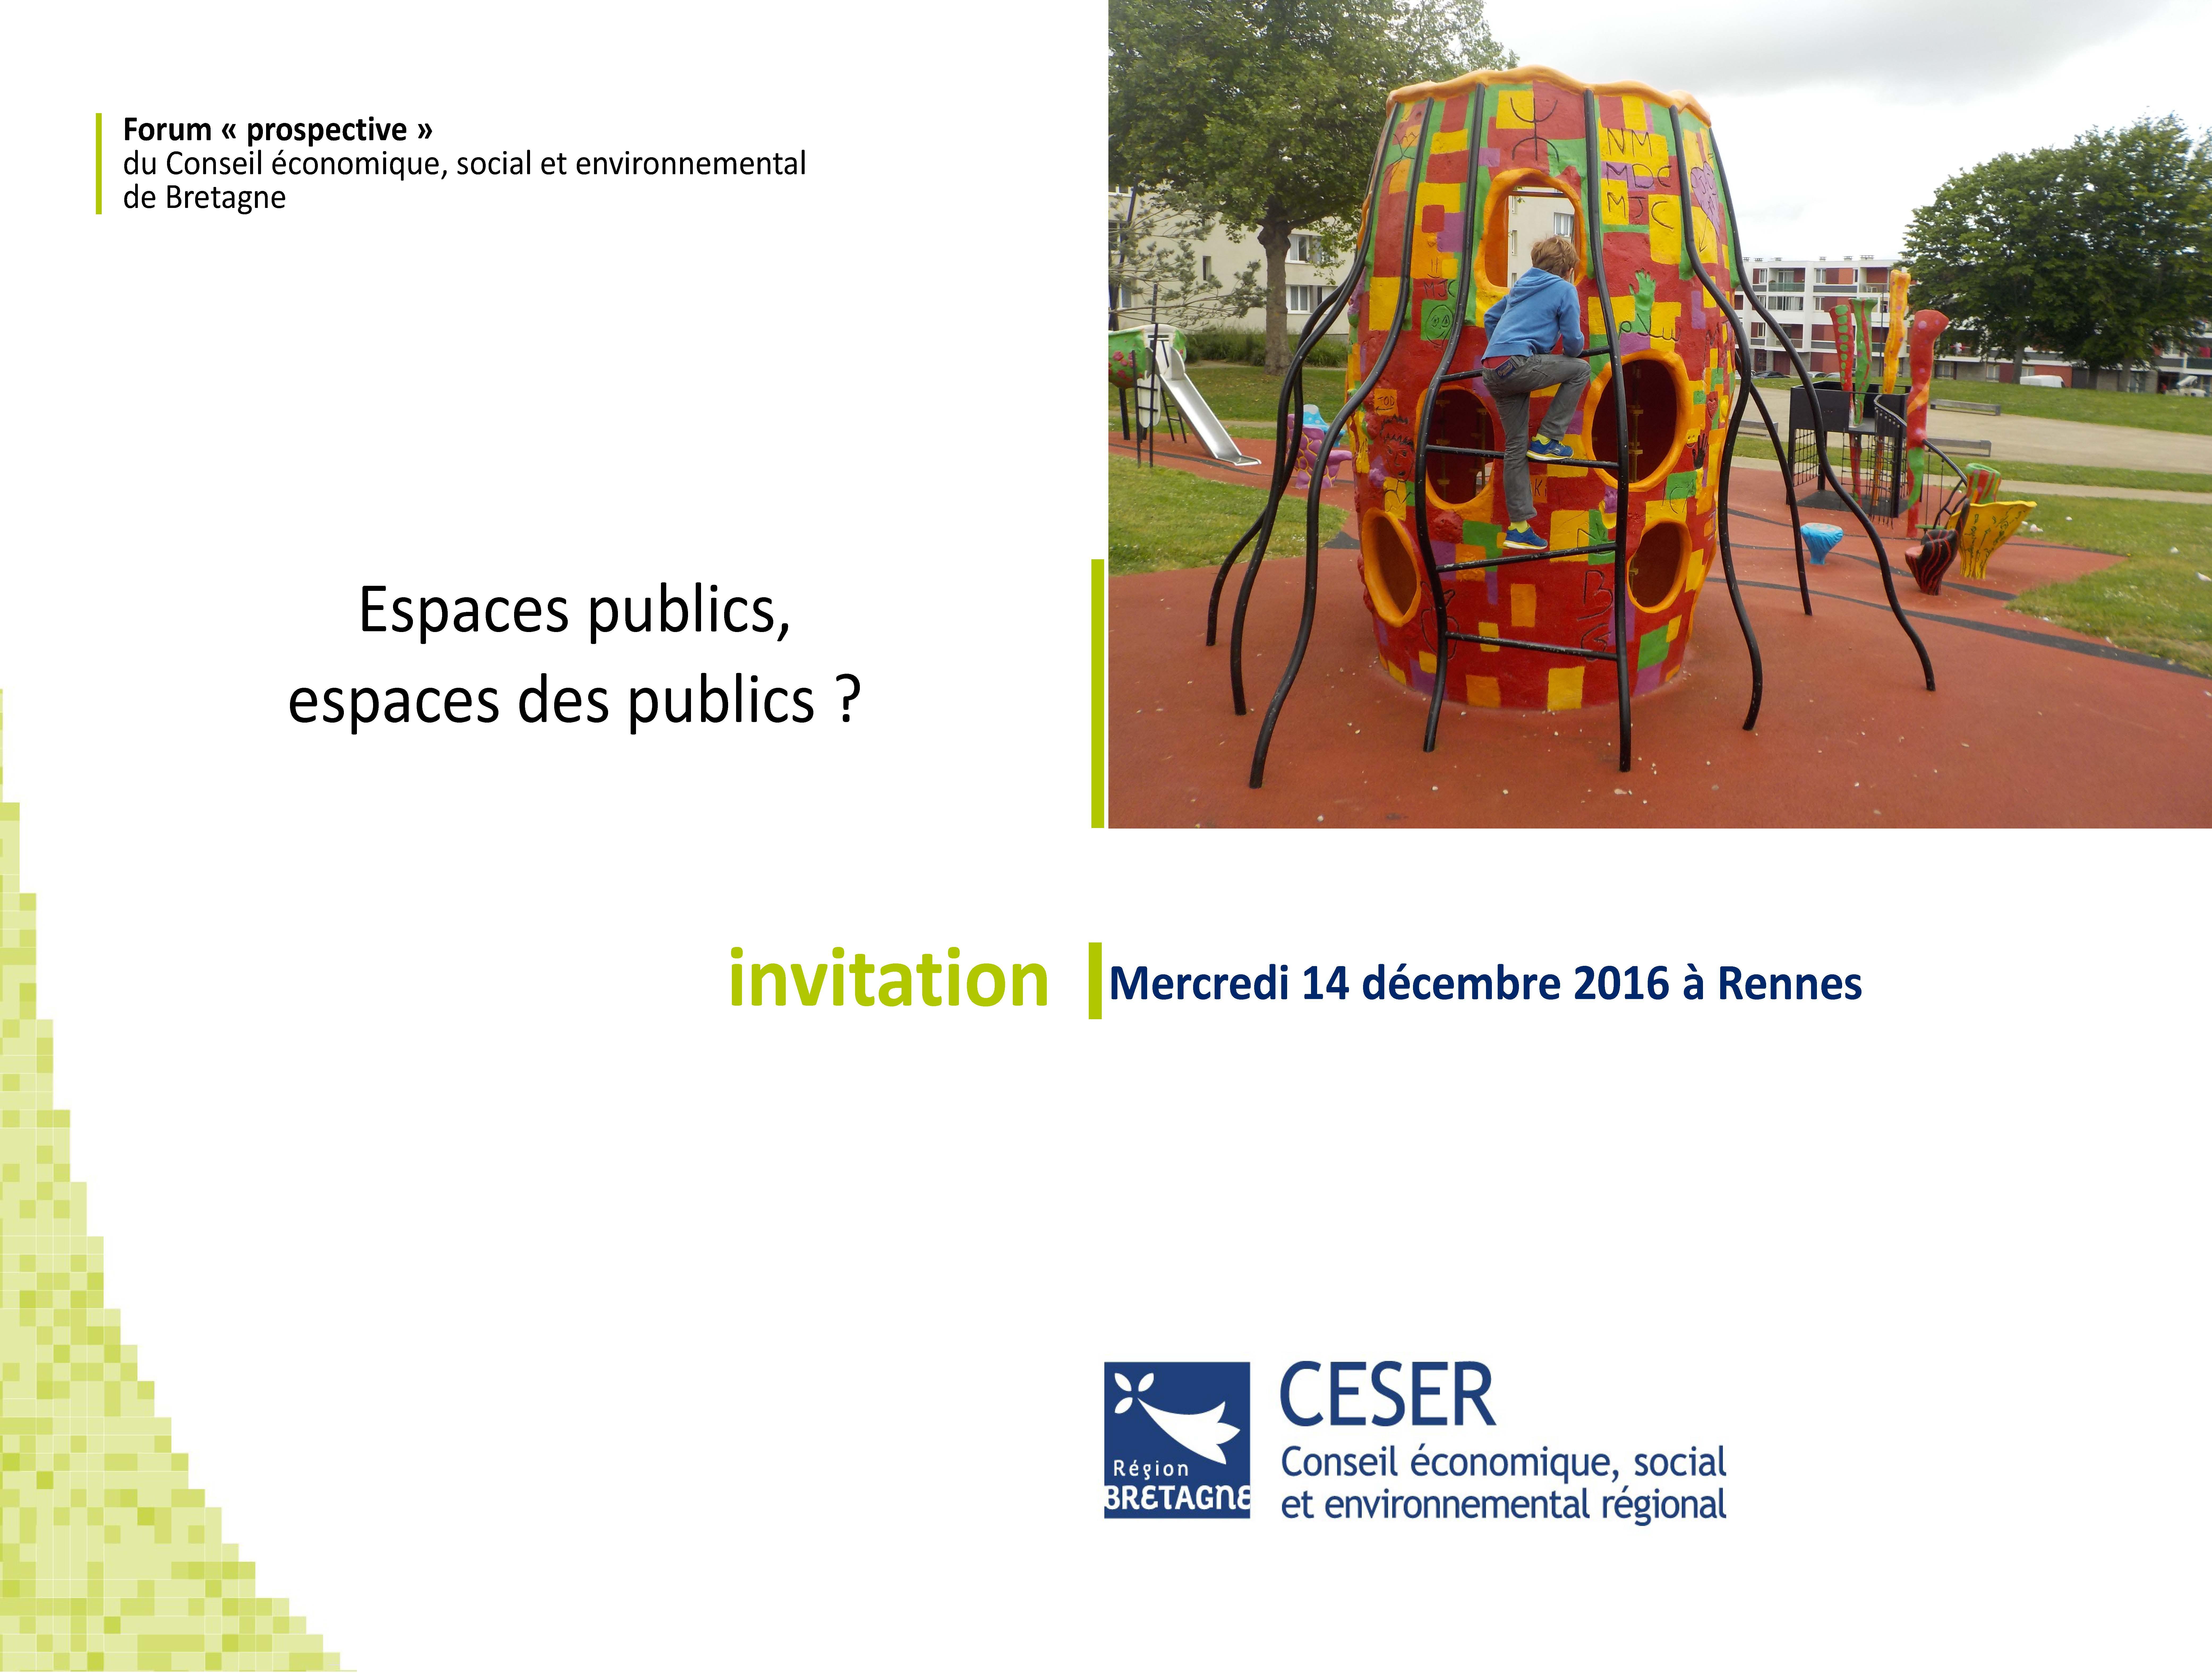 carton_invitation_forum_espaces_publics8_page_1